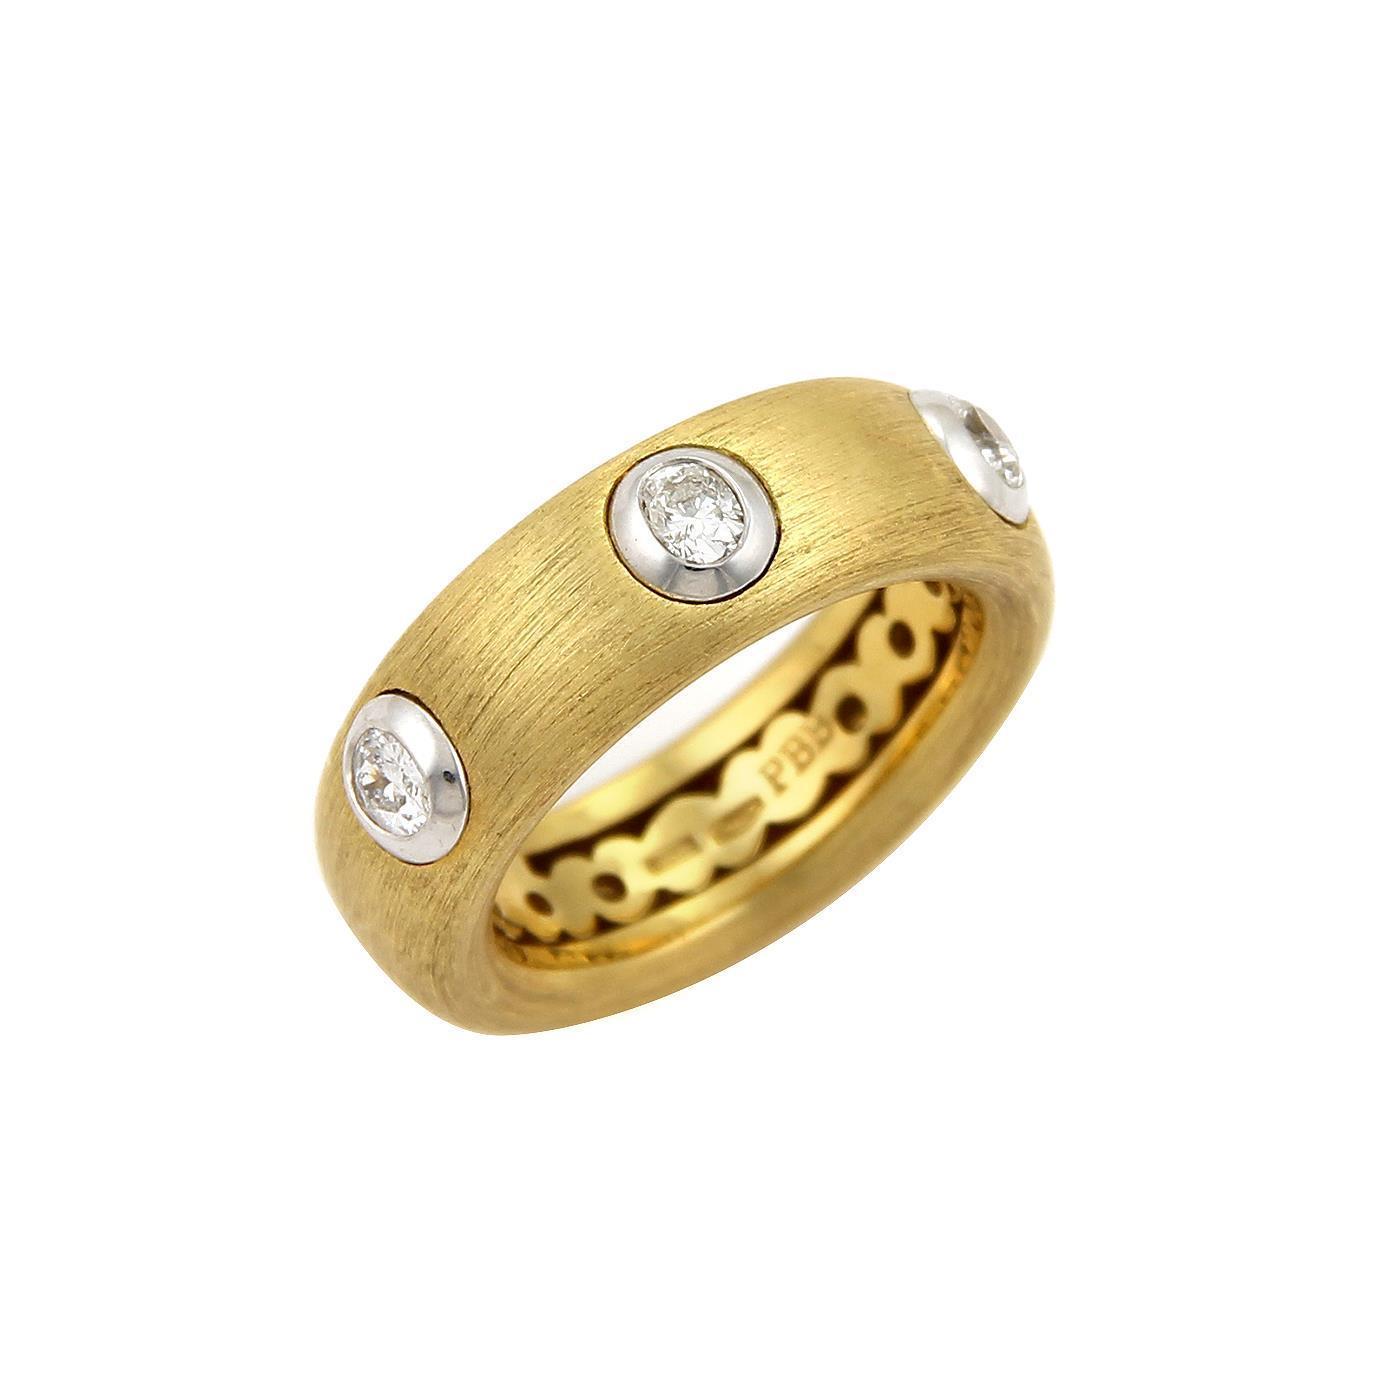 """""Pasquale Bruni 18K Yellow Gold & 0.40ct Diamond Ring Sz 7"""""" 731088"